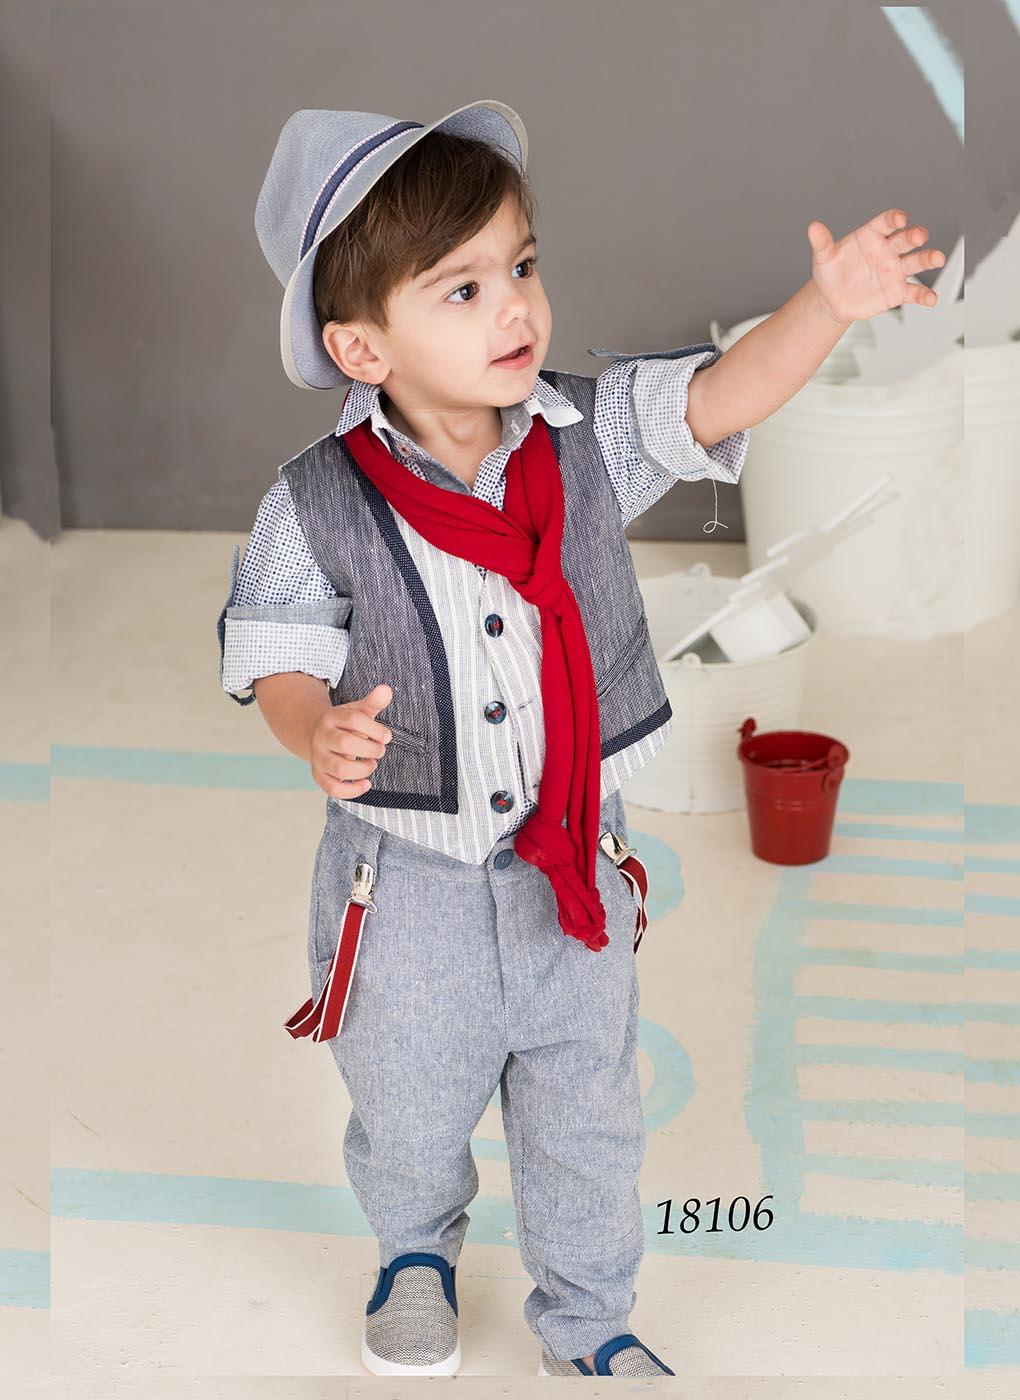 284cba833957 κουστούμι βάπτισης Bonito baby 18106